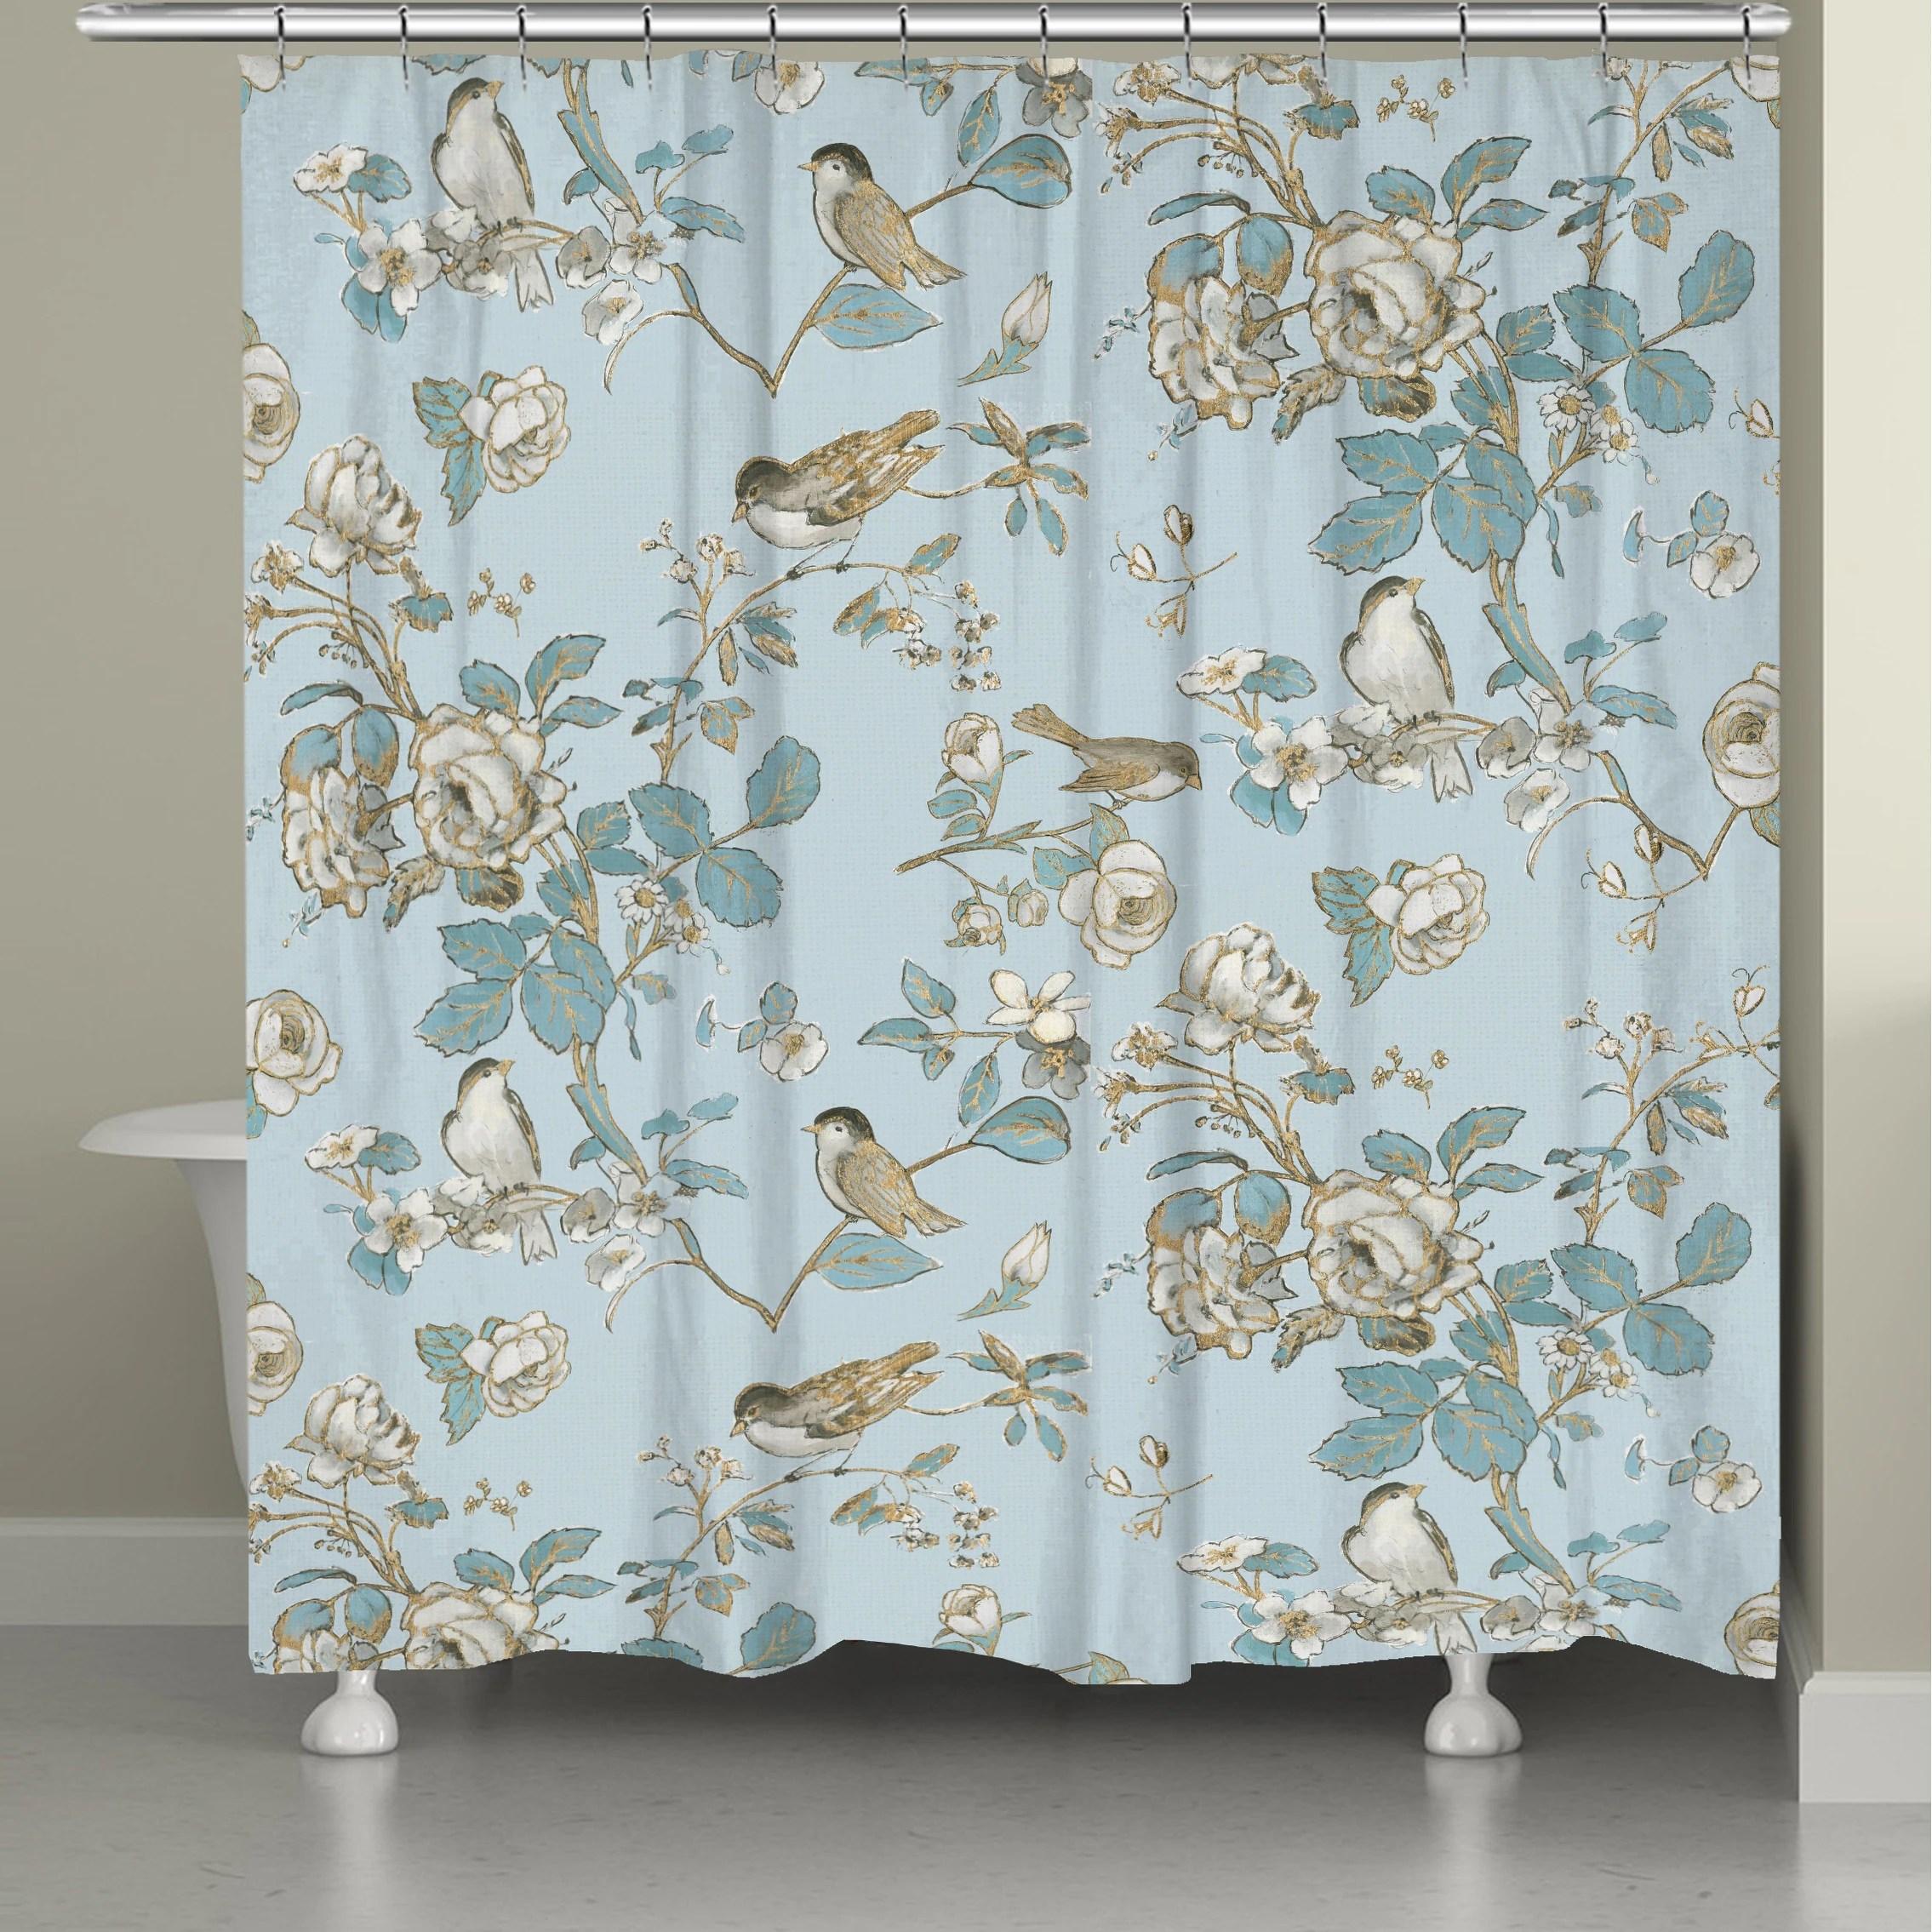 toile birds shower curtain